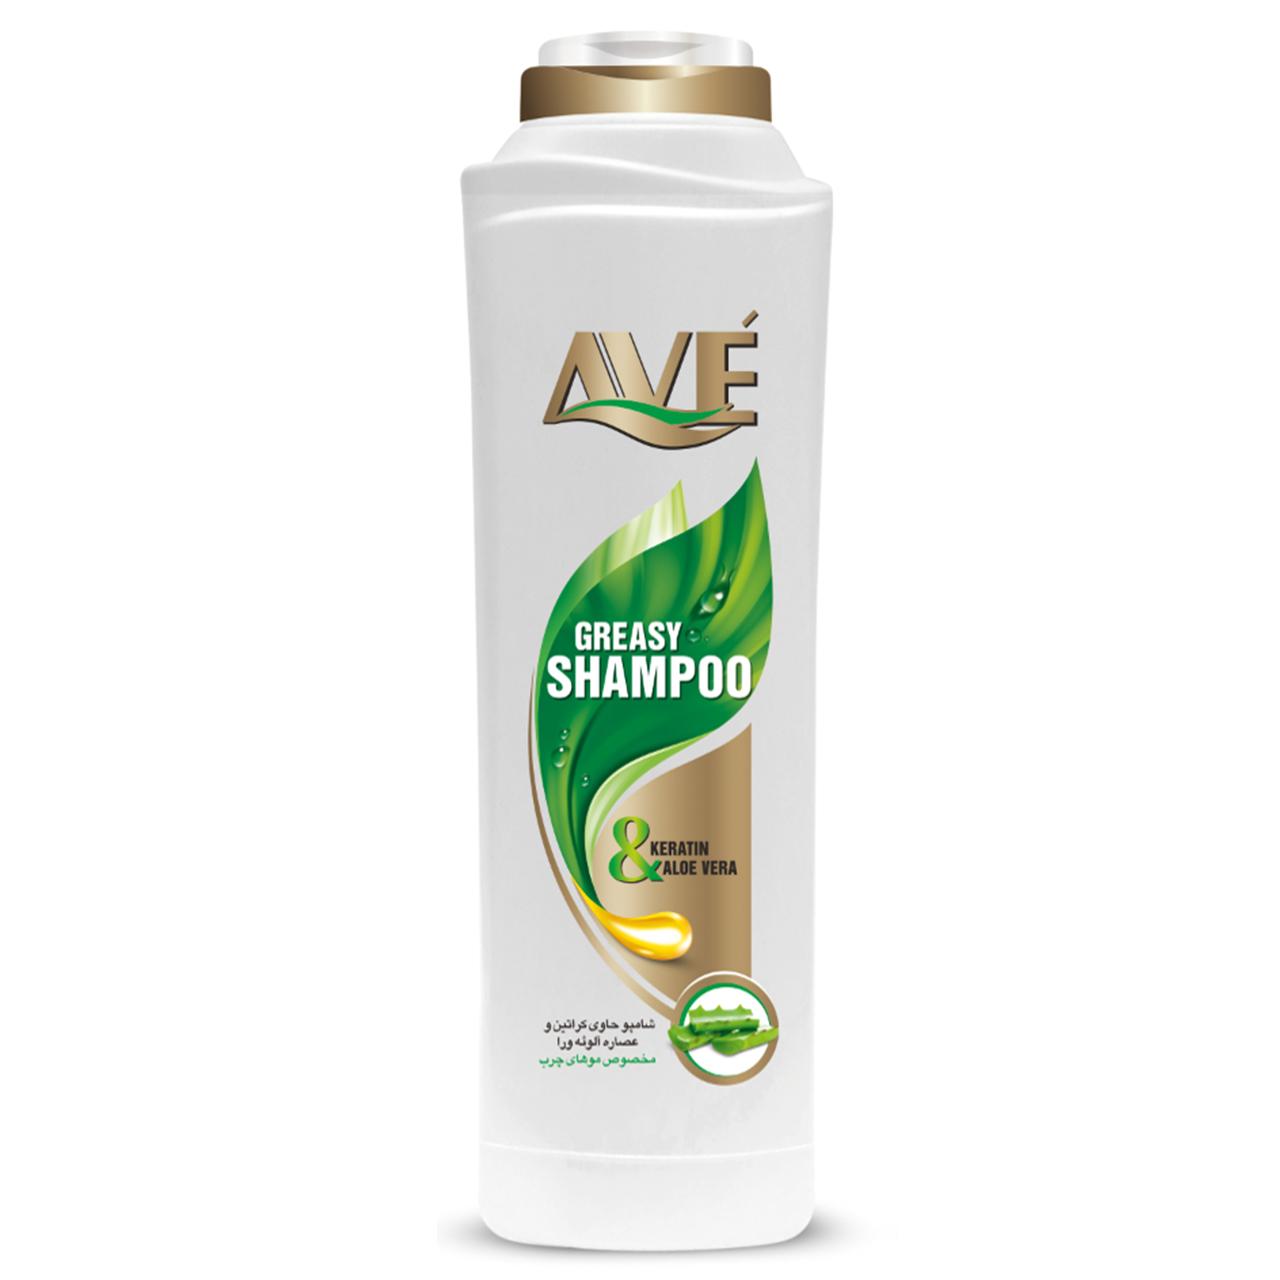 قیمت شامپو اوه مدل Aloevera حجم 400 میلی لیتر